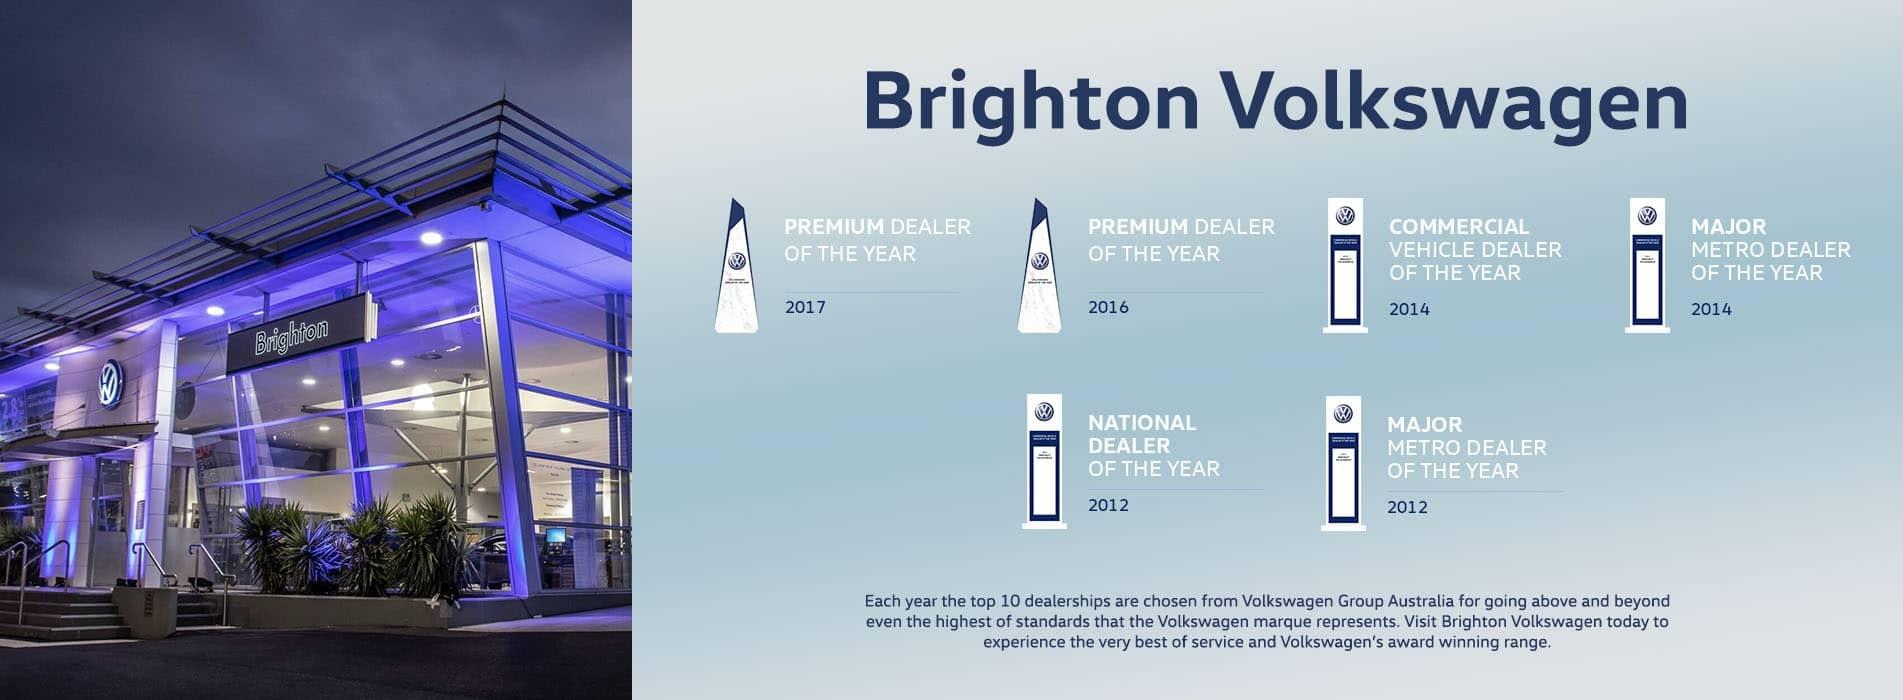 Brighton Volkswagen Awards